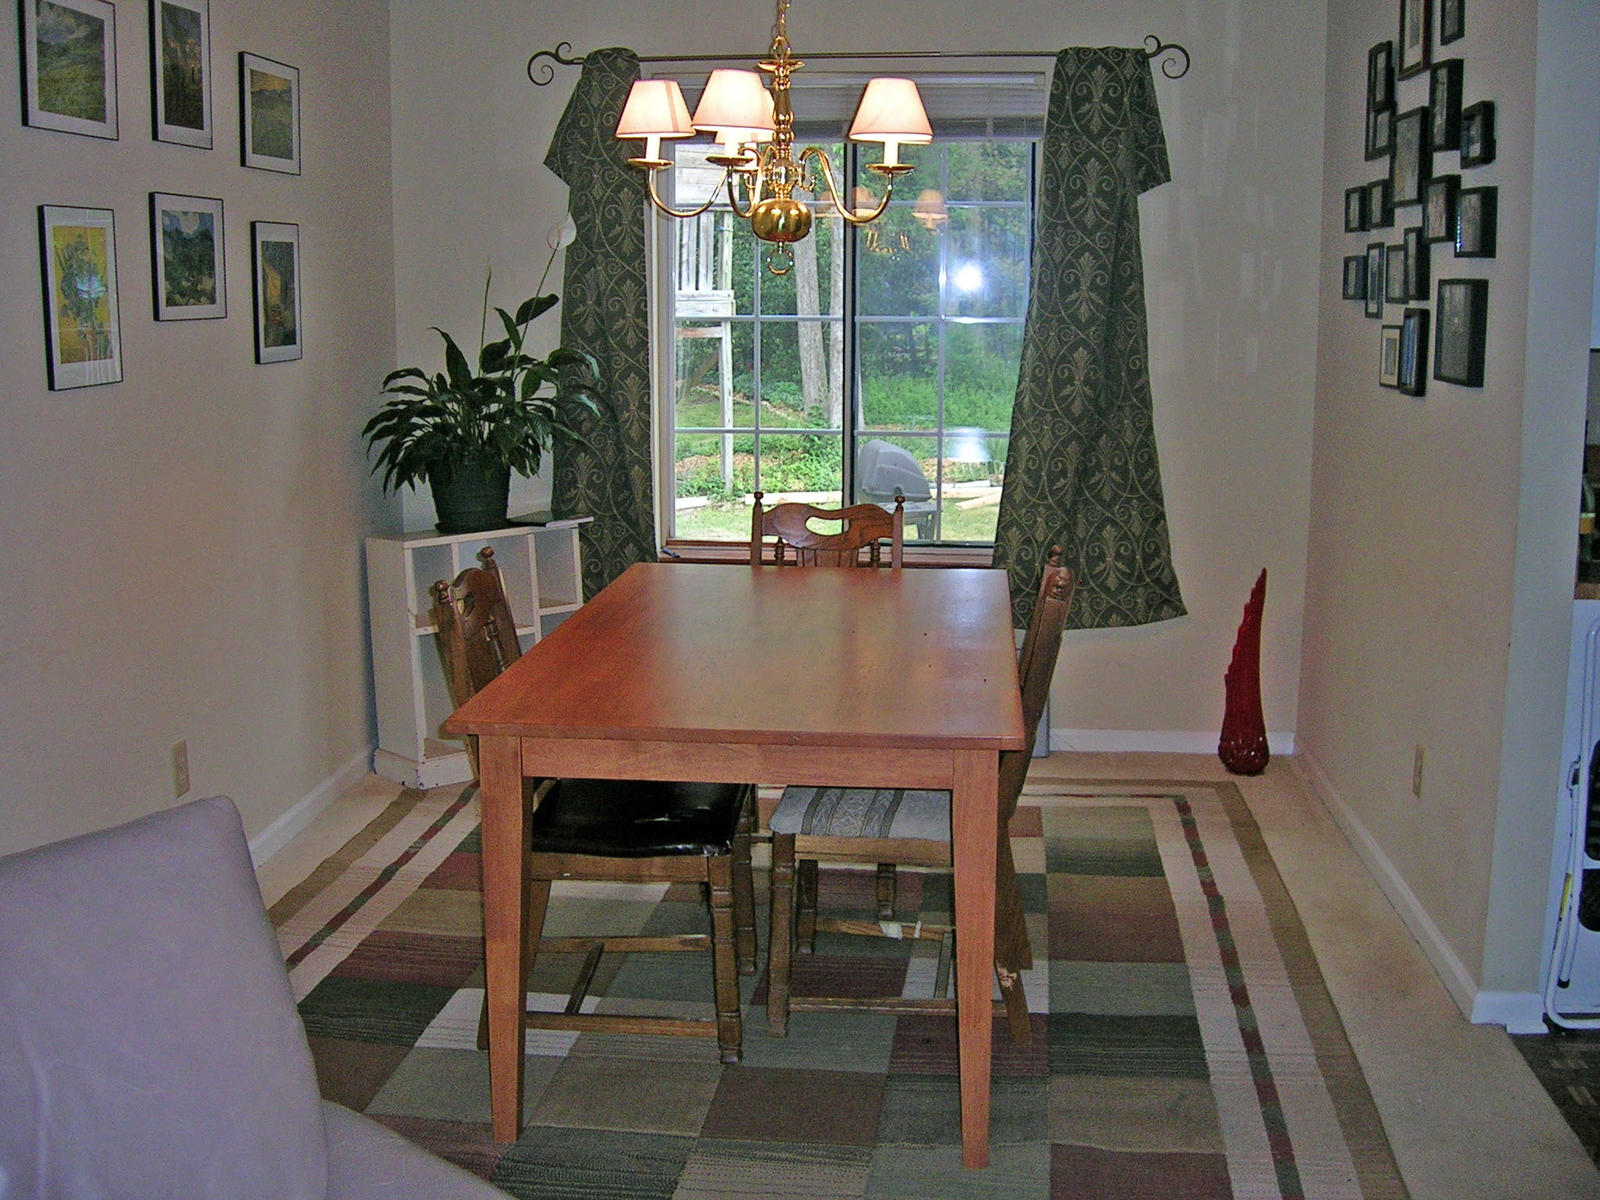 4br 1900 Sf Home For Sale Ne Raleigh North Carolina